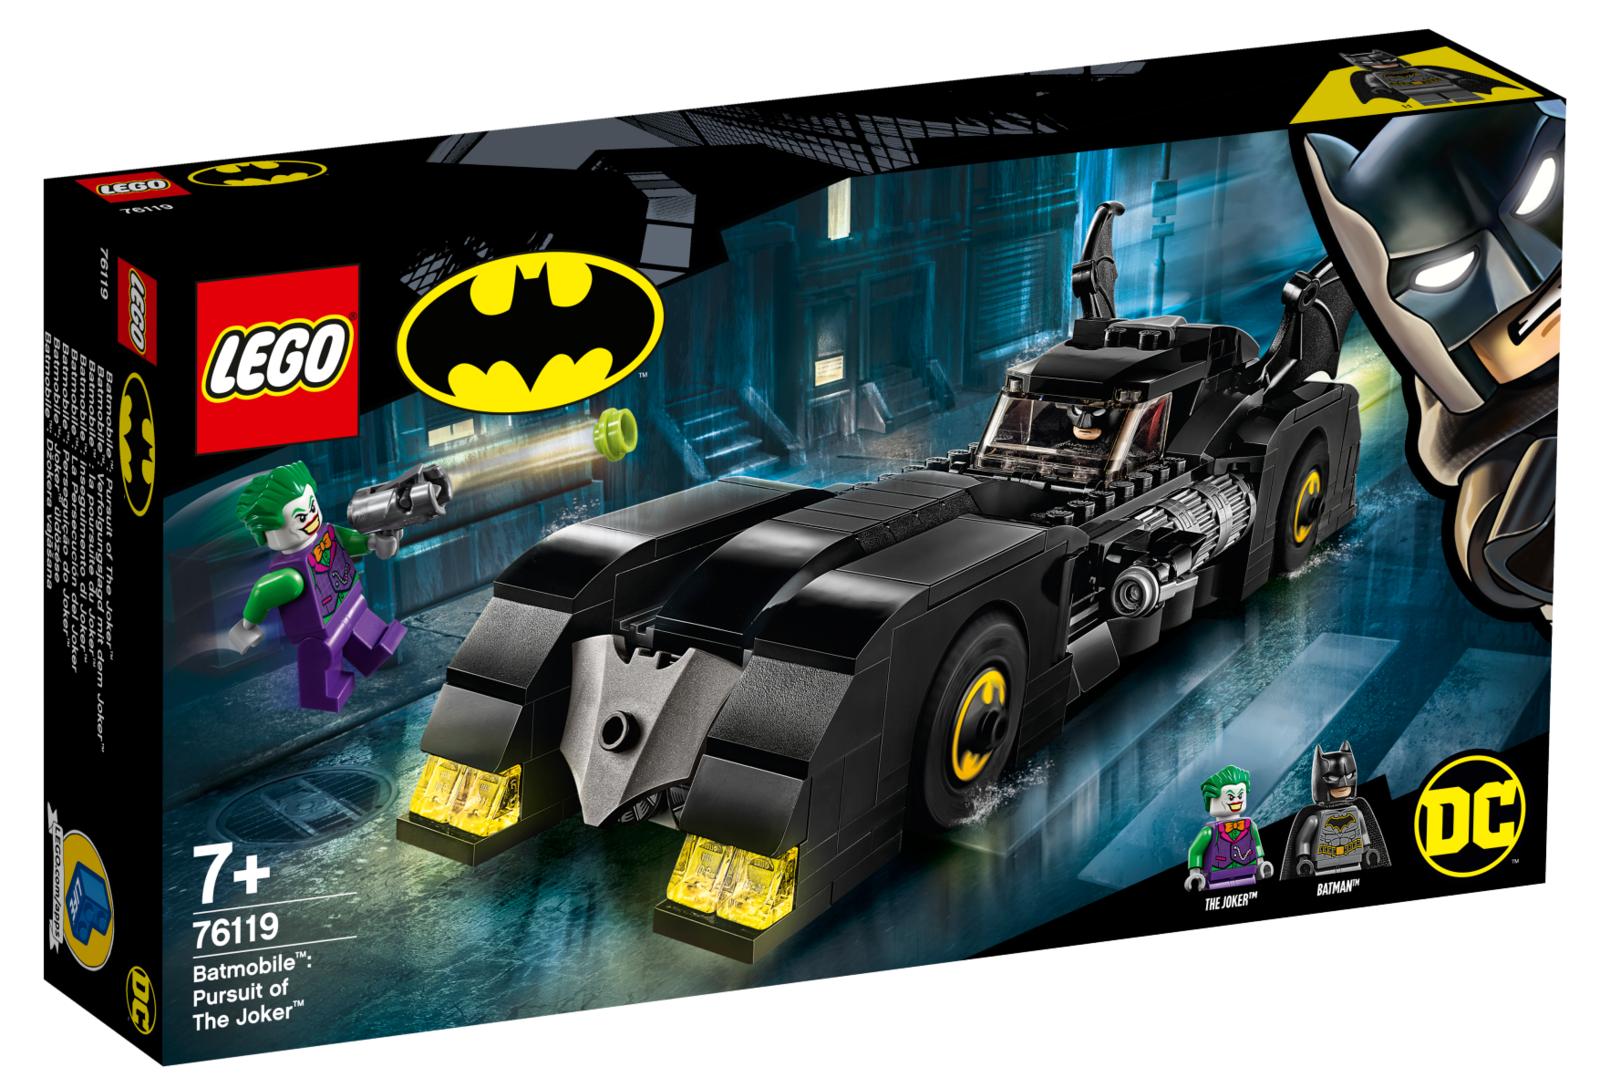 LEGO Super Heroes: Batmobile - Pursuit of The Joker (76119) image